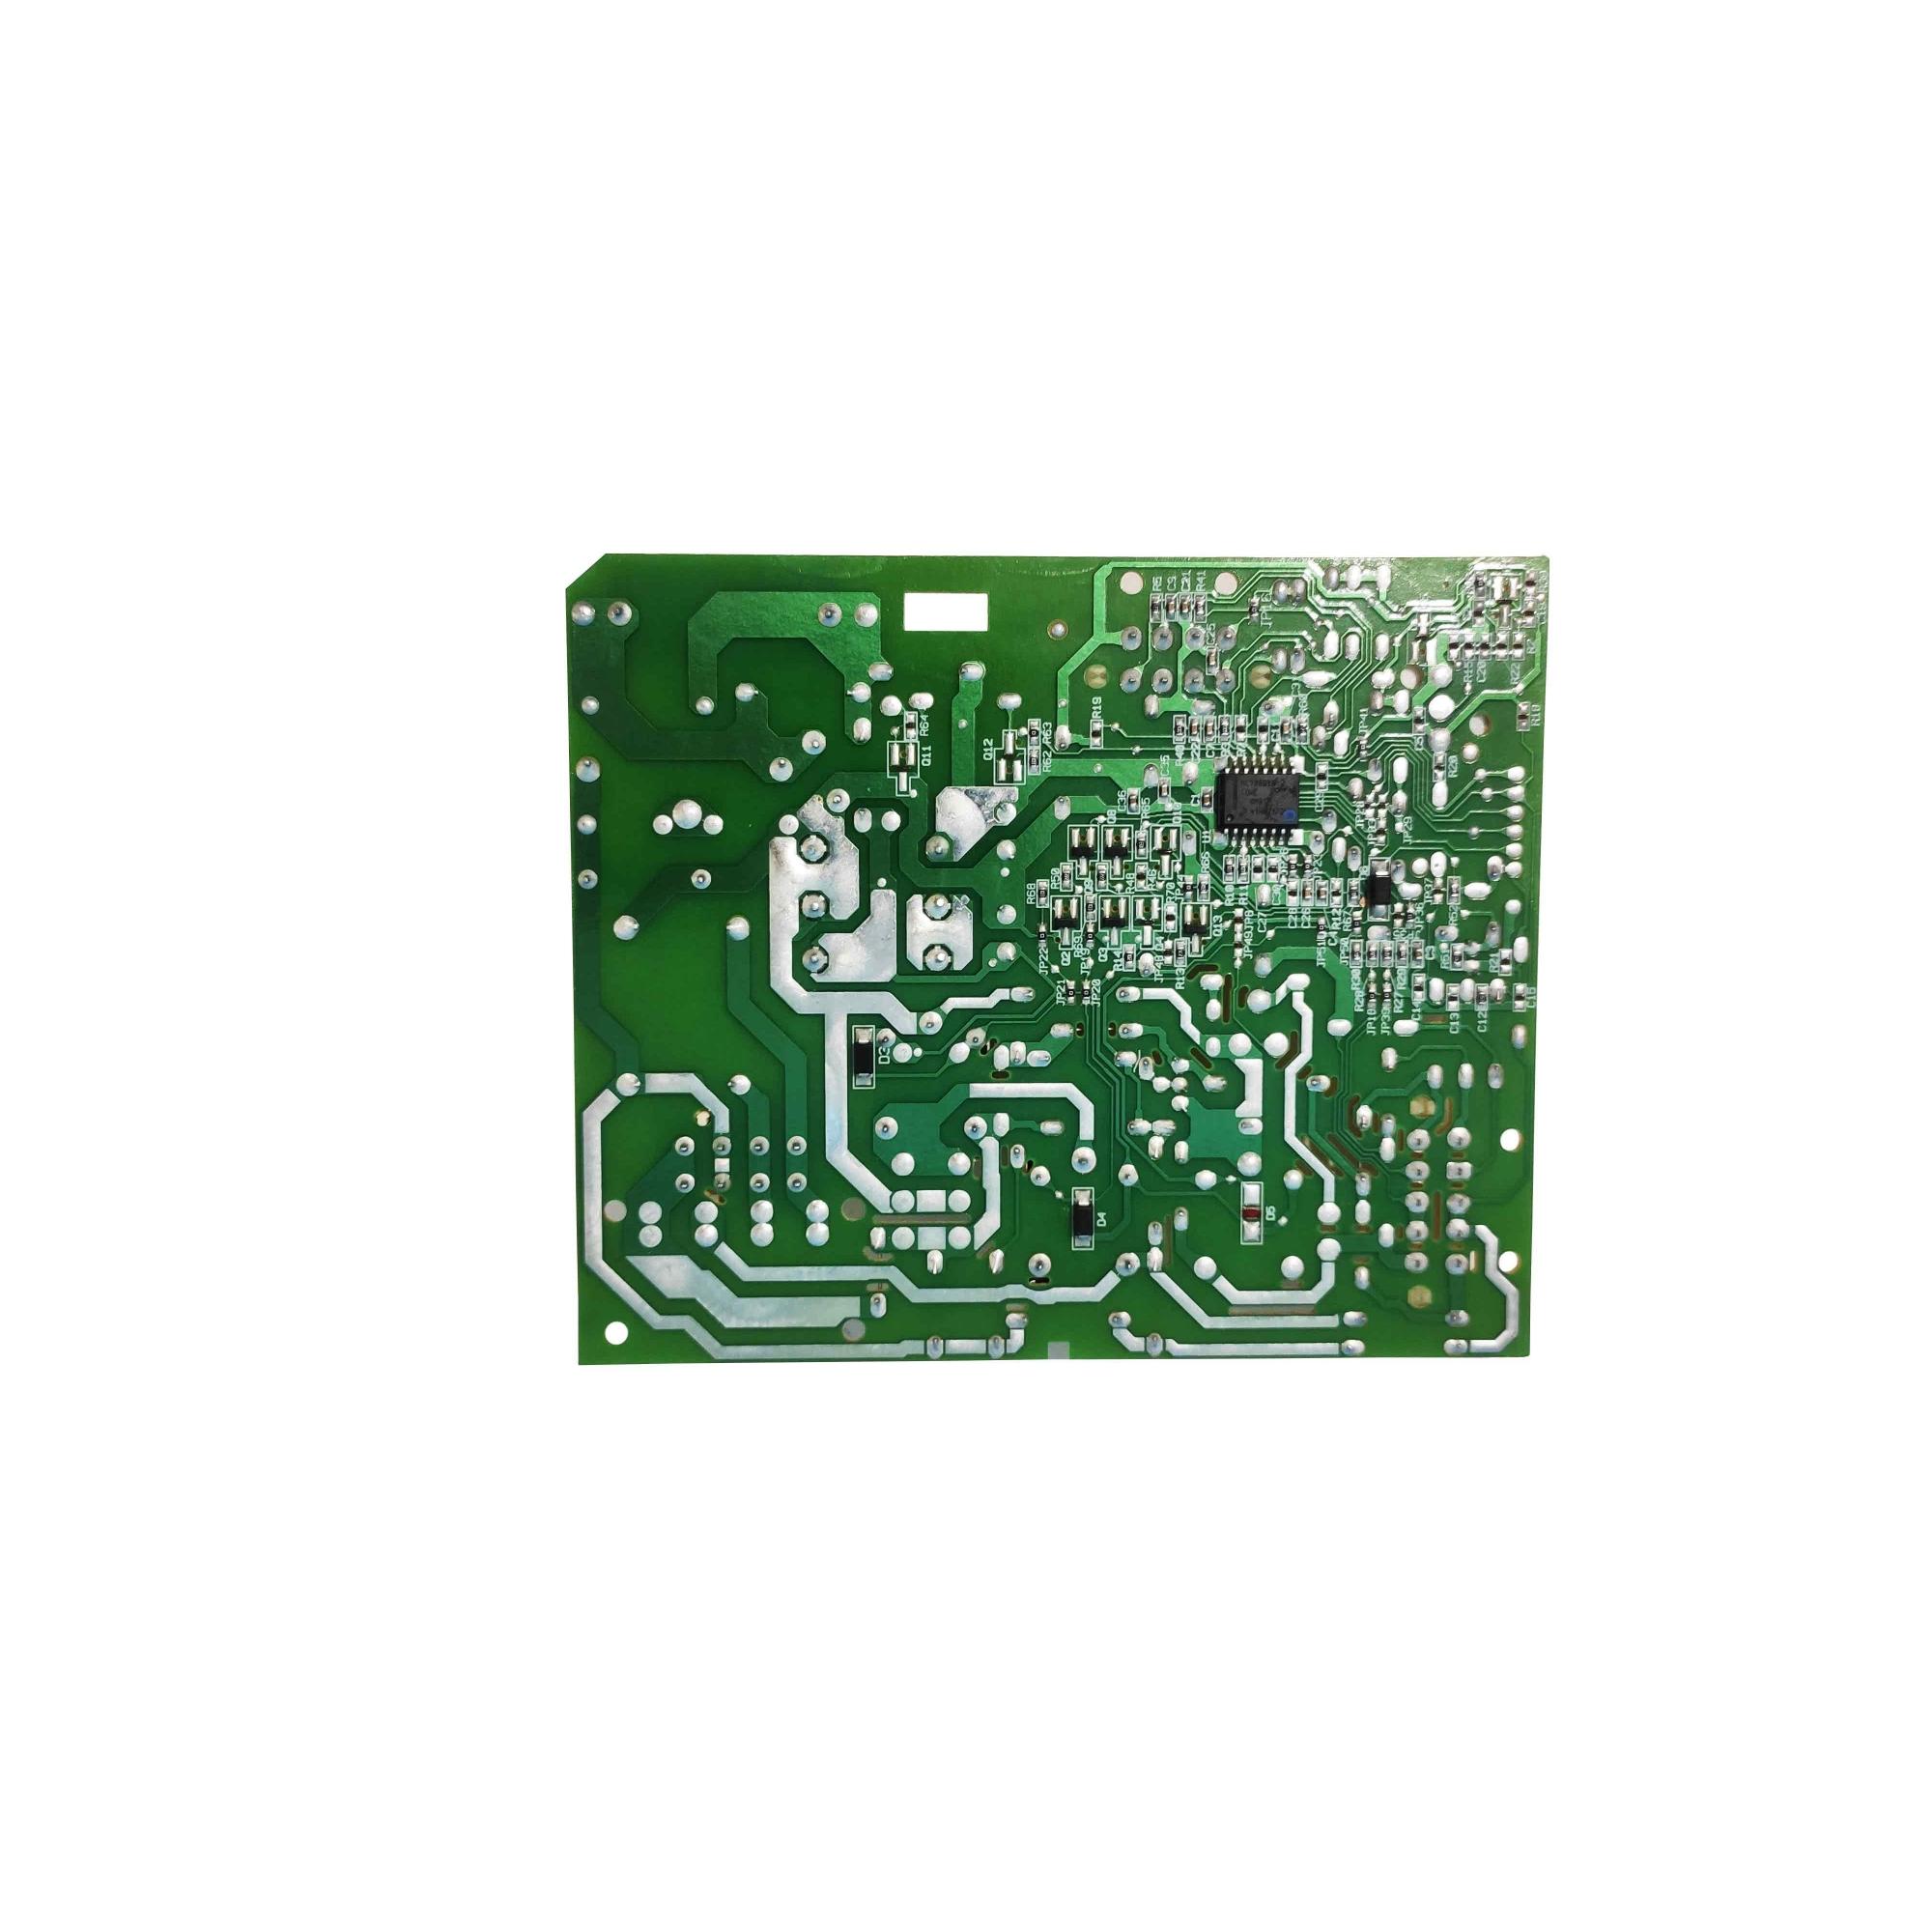 Controle Eletrônico Freezer Brastemp 220V W10662208